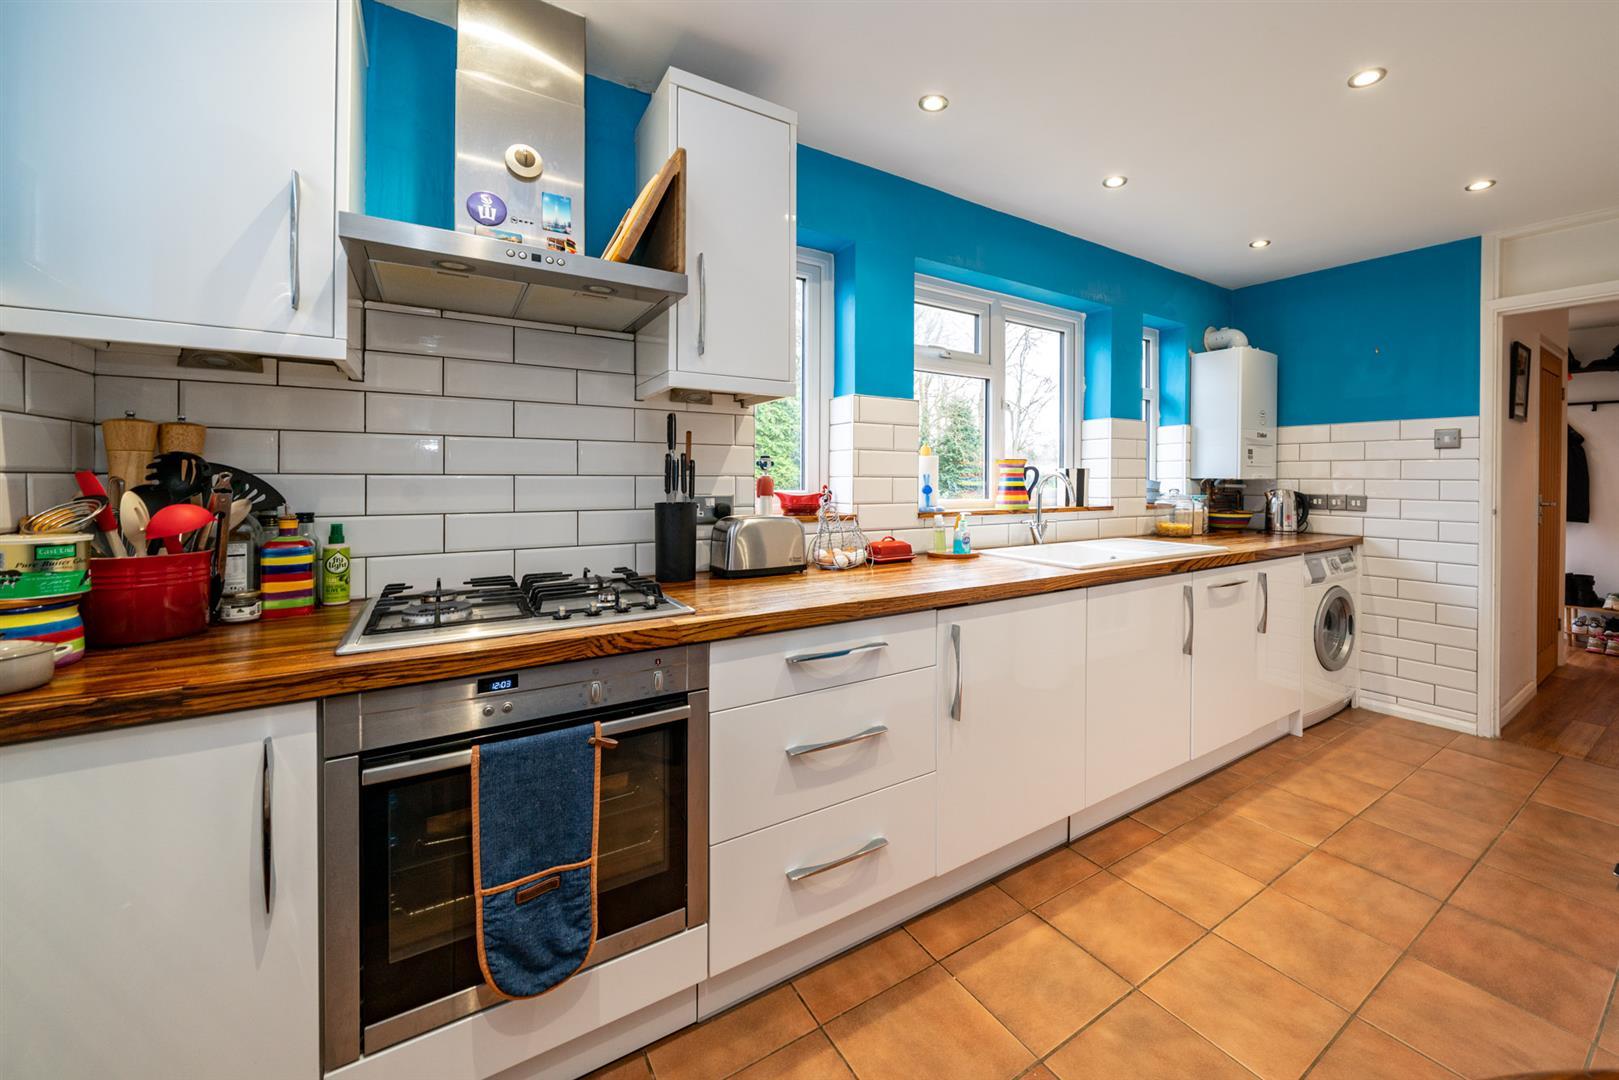 Flat-6-Ruscoe-5087 - kitchen 2.jpg